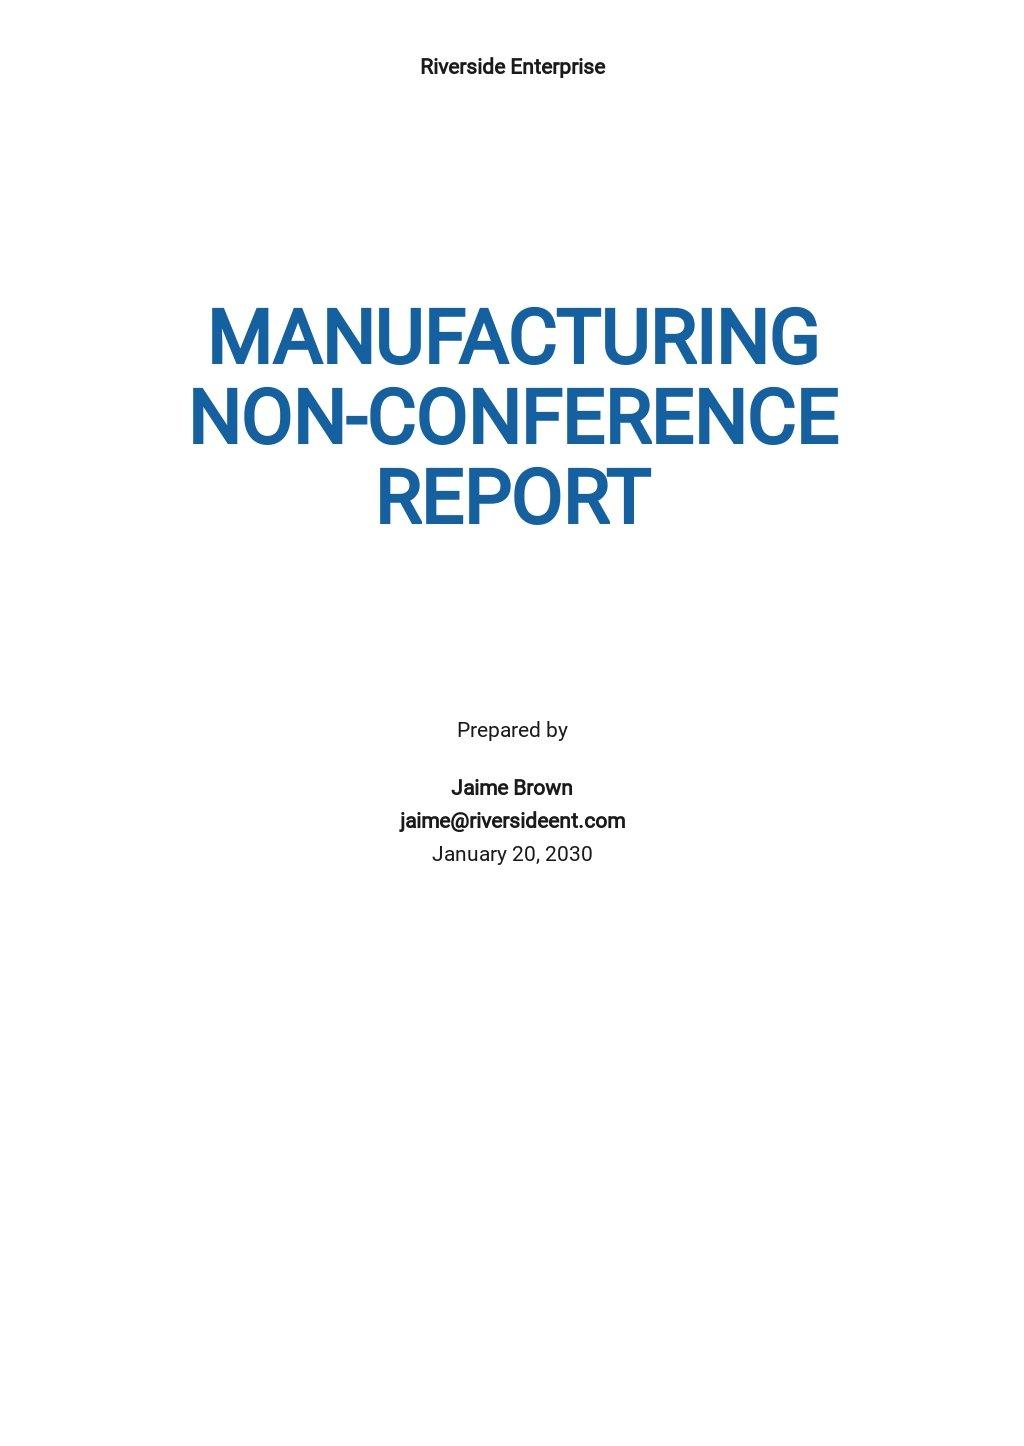 Manufacturing Non-Conformance Report Template